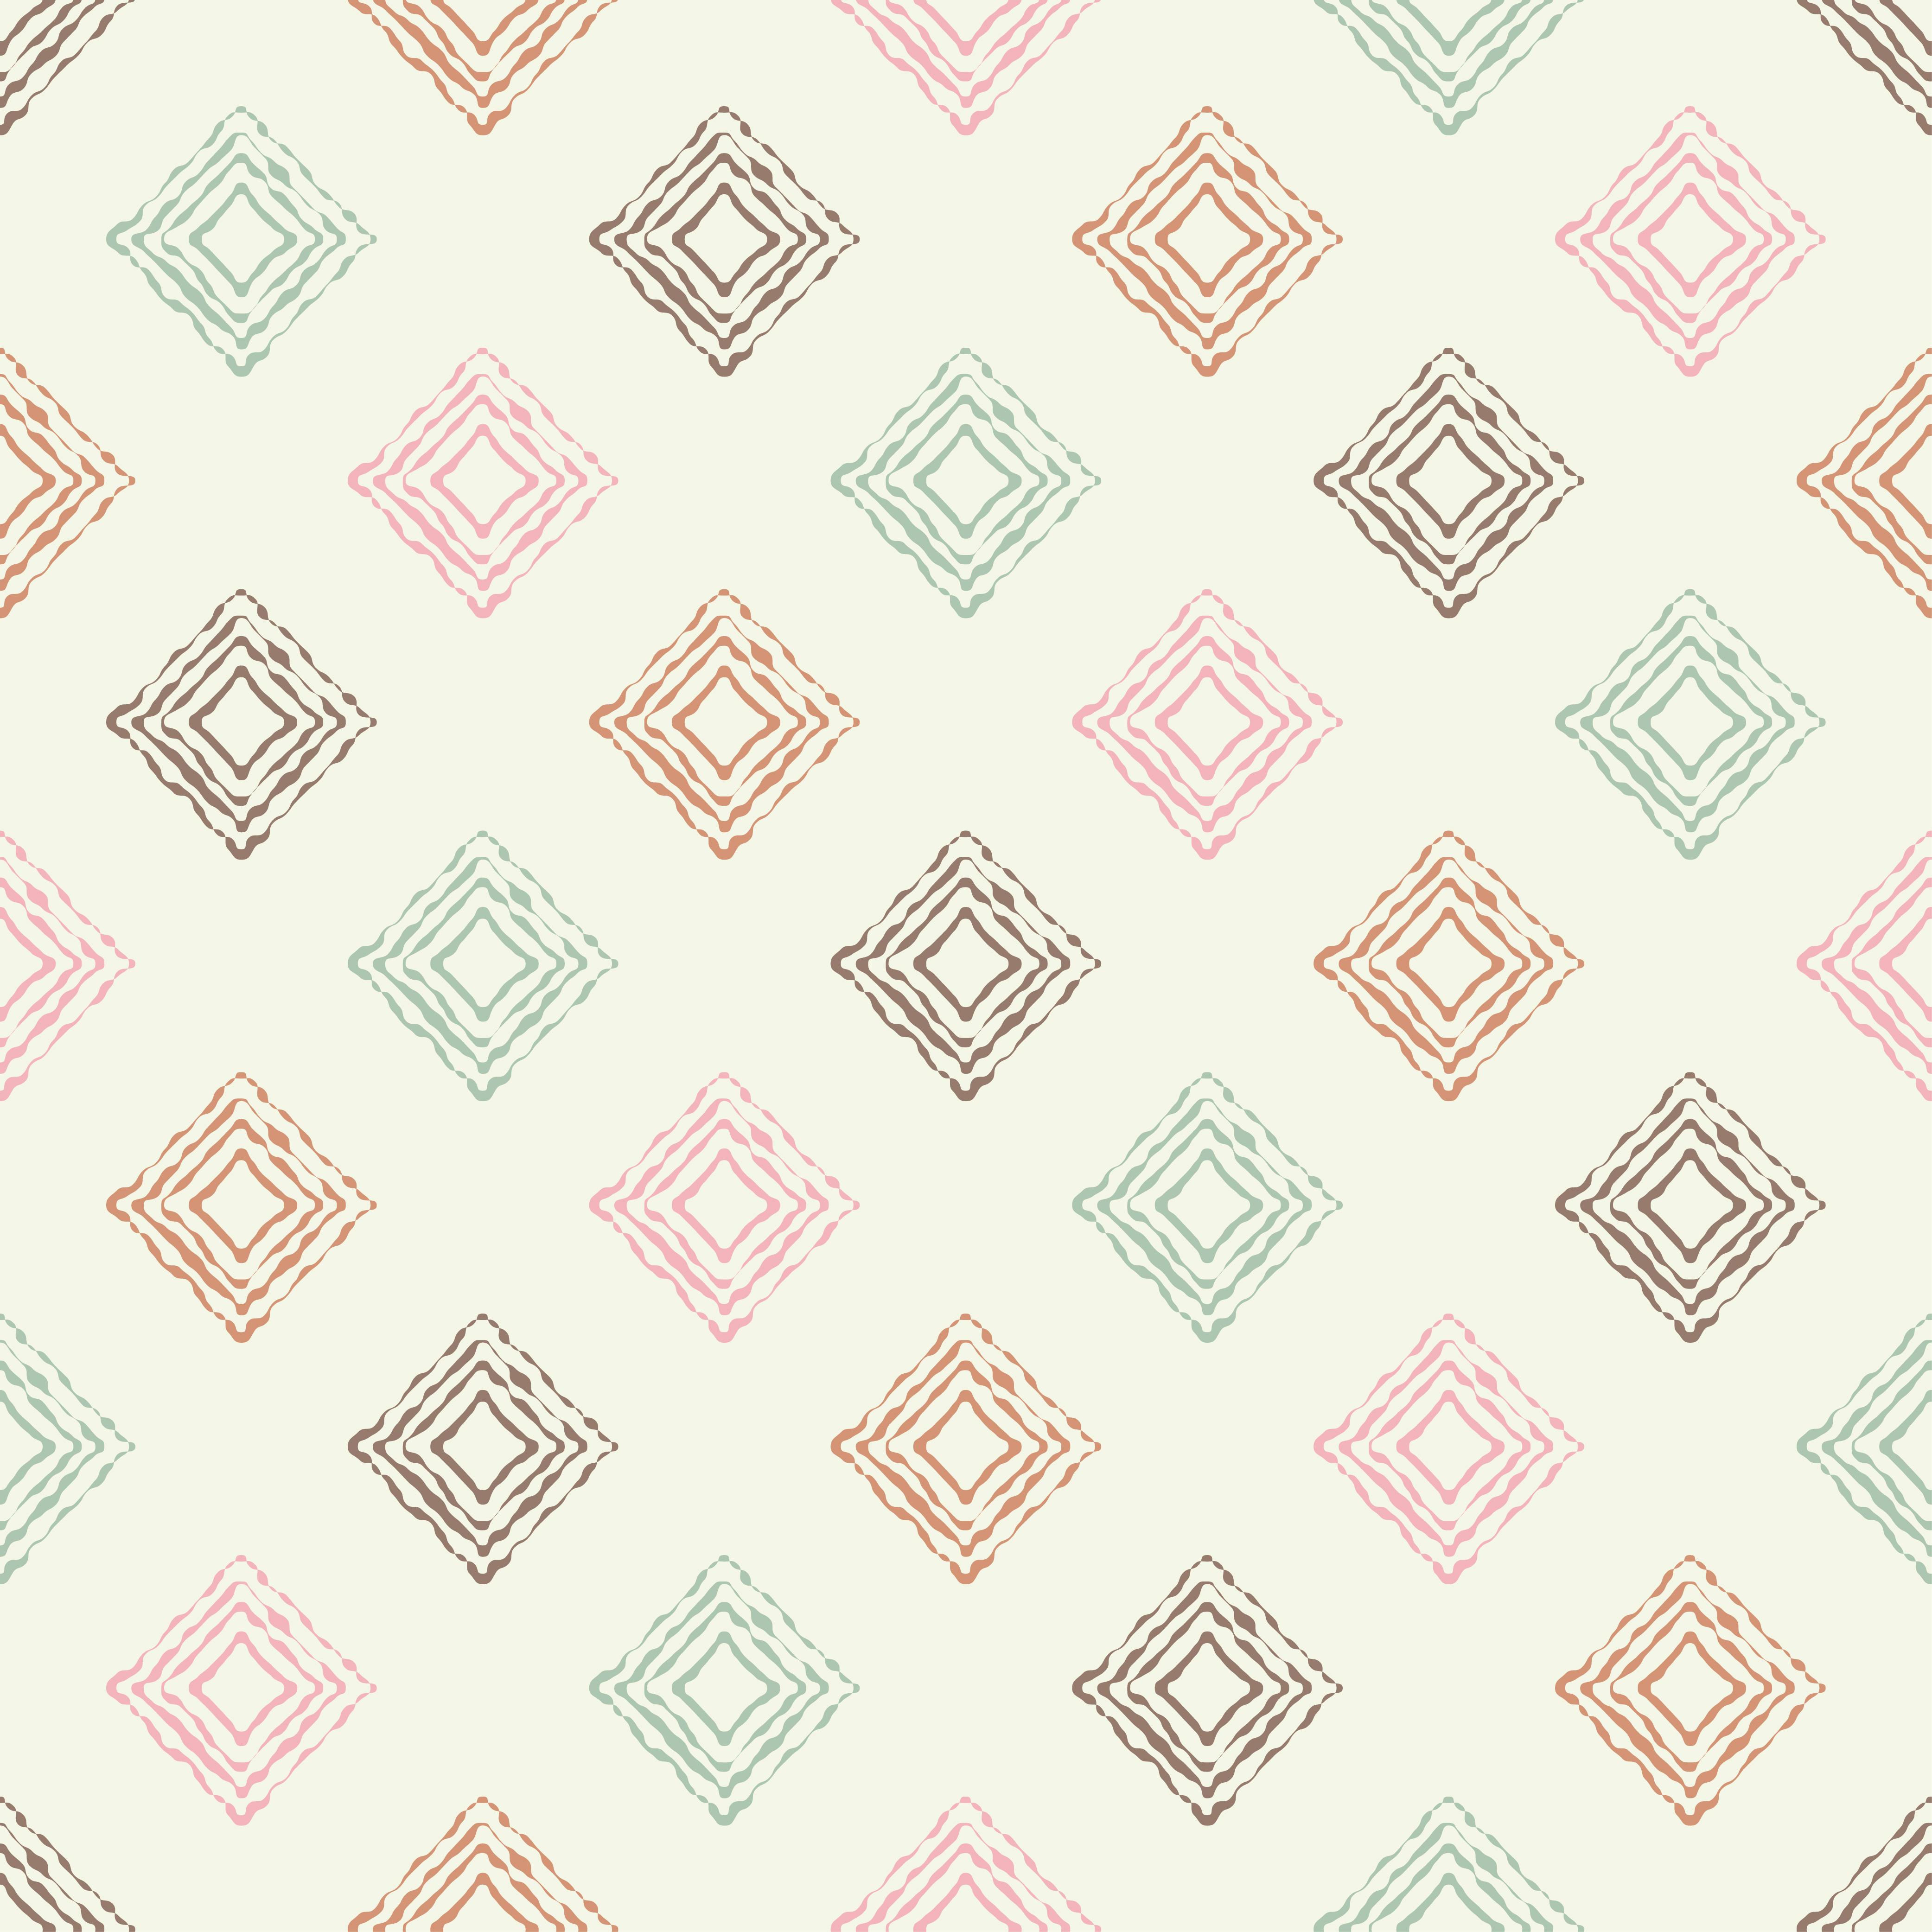 6 Ethnic boho seamless pattern. Scribble texture. Retro motif. example image 2